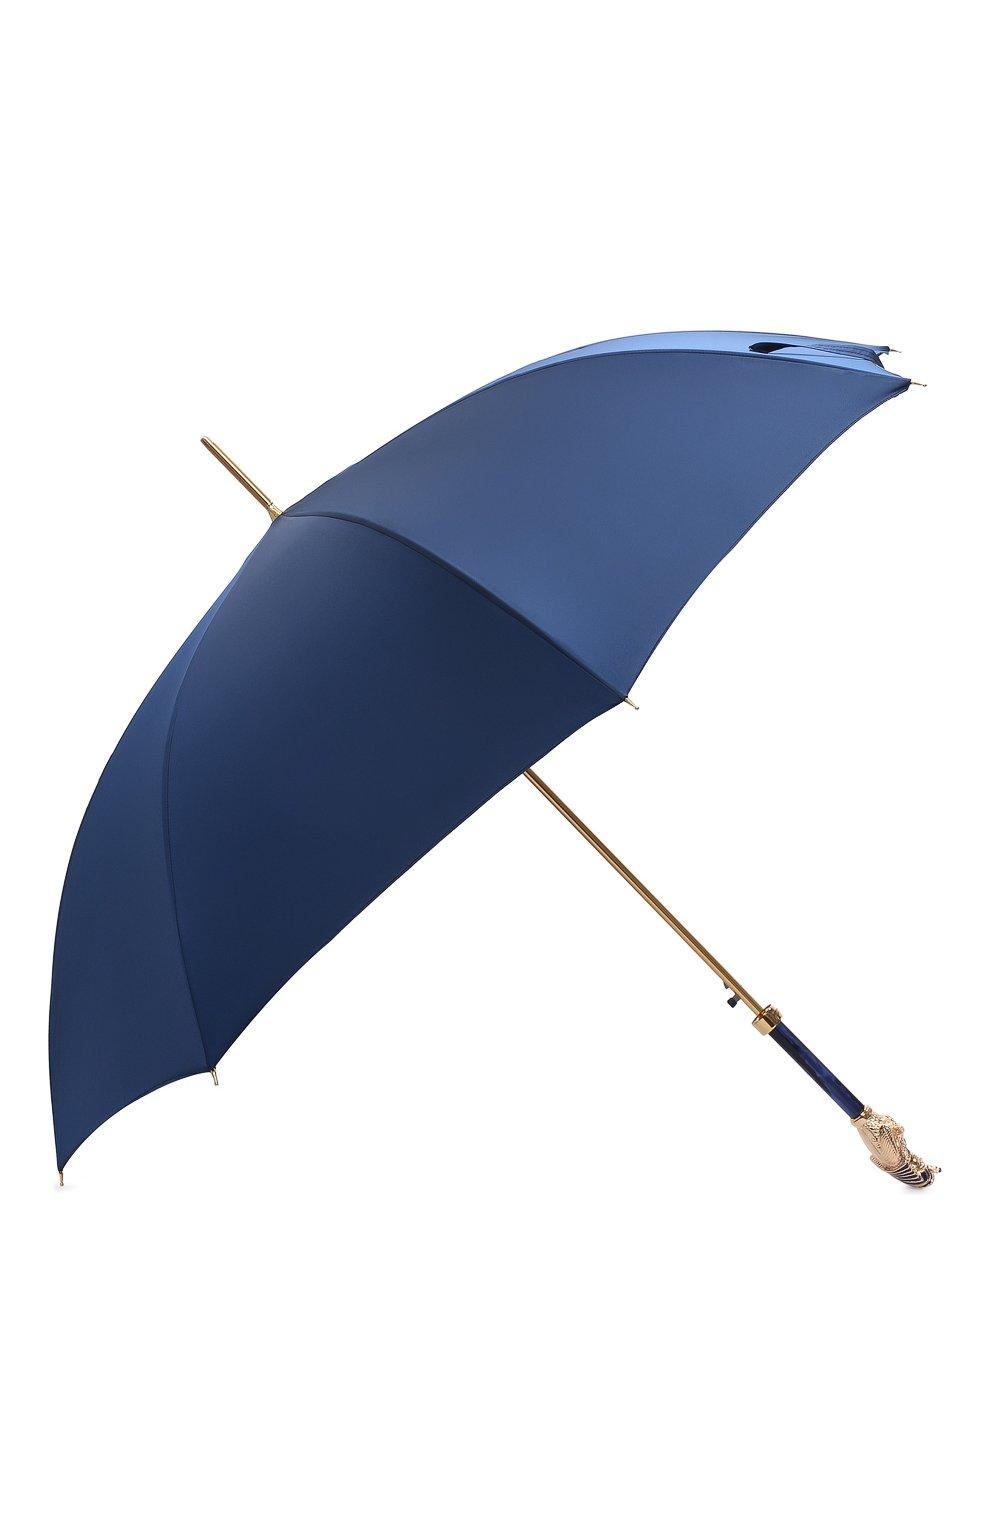 Мужской зонт-трость PASOTTI OMBRELLI темно-синего цвета, арт. 479/RAS0 0XF0RD/8/K68 | Фото 2 (Материал: Текстиль, Синтетический материал, Металл)